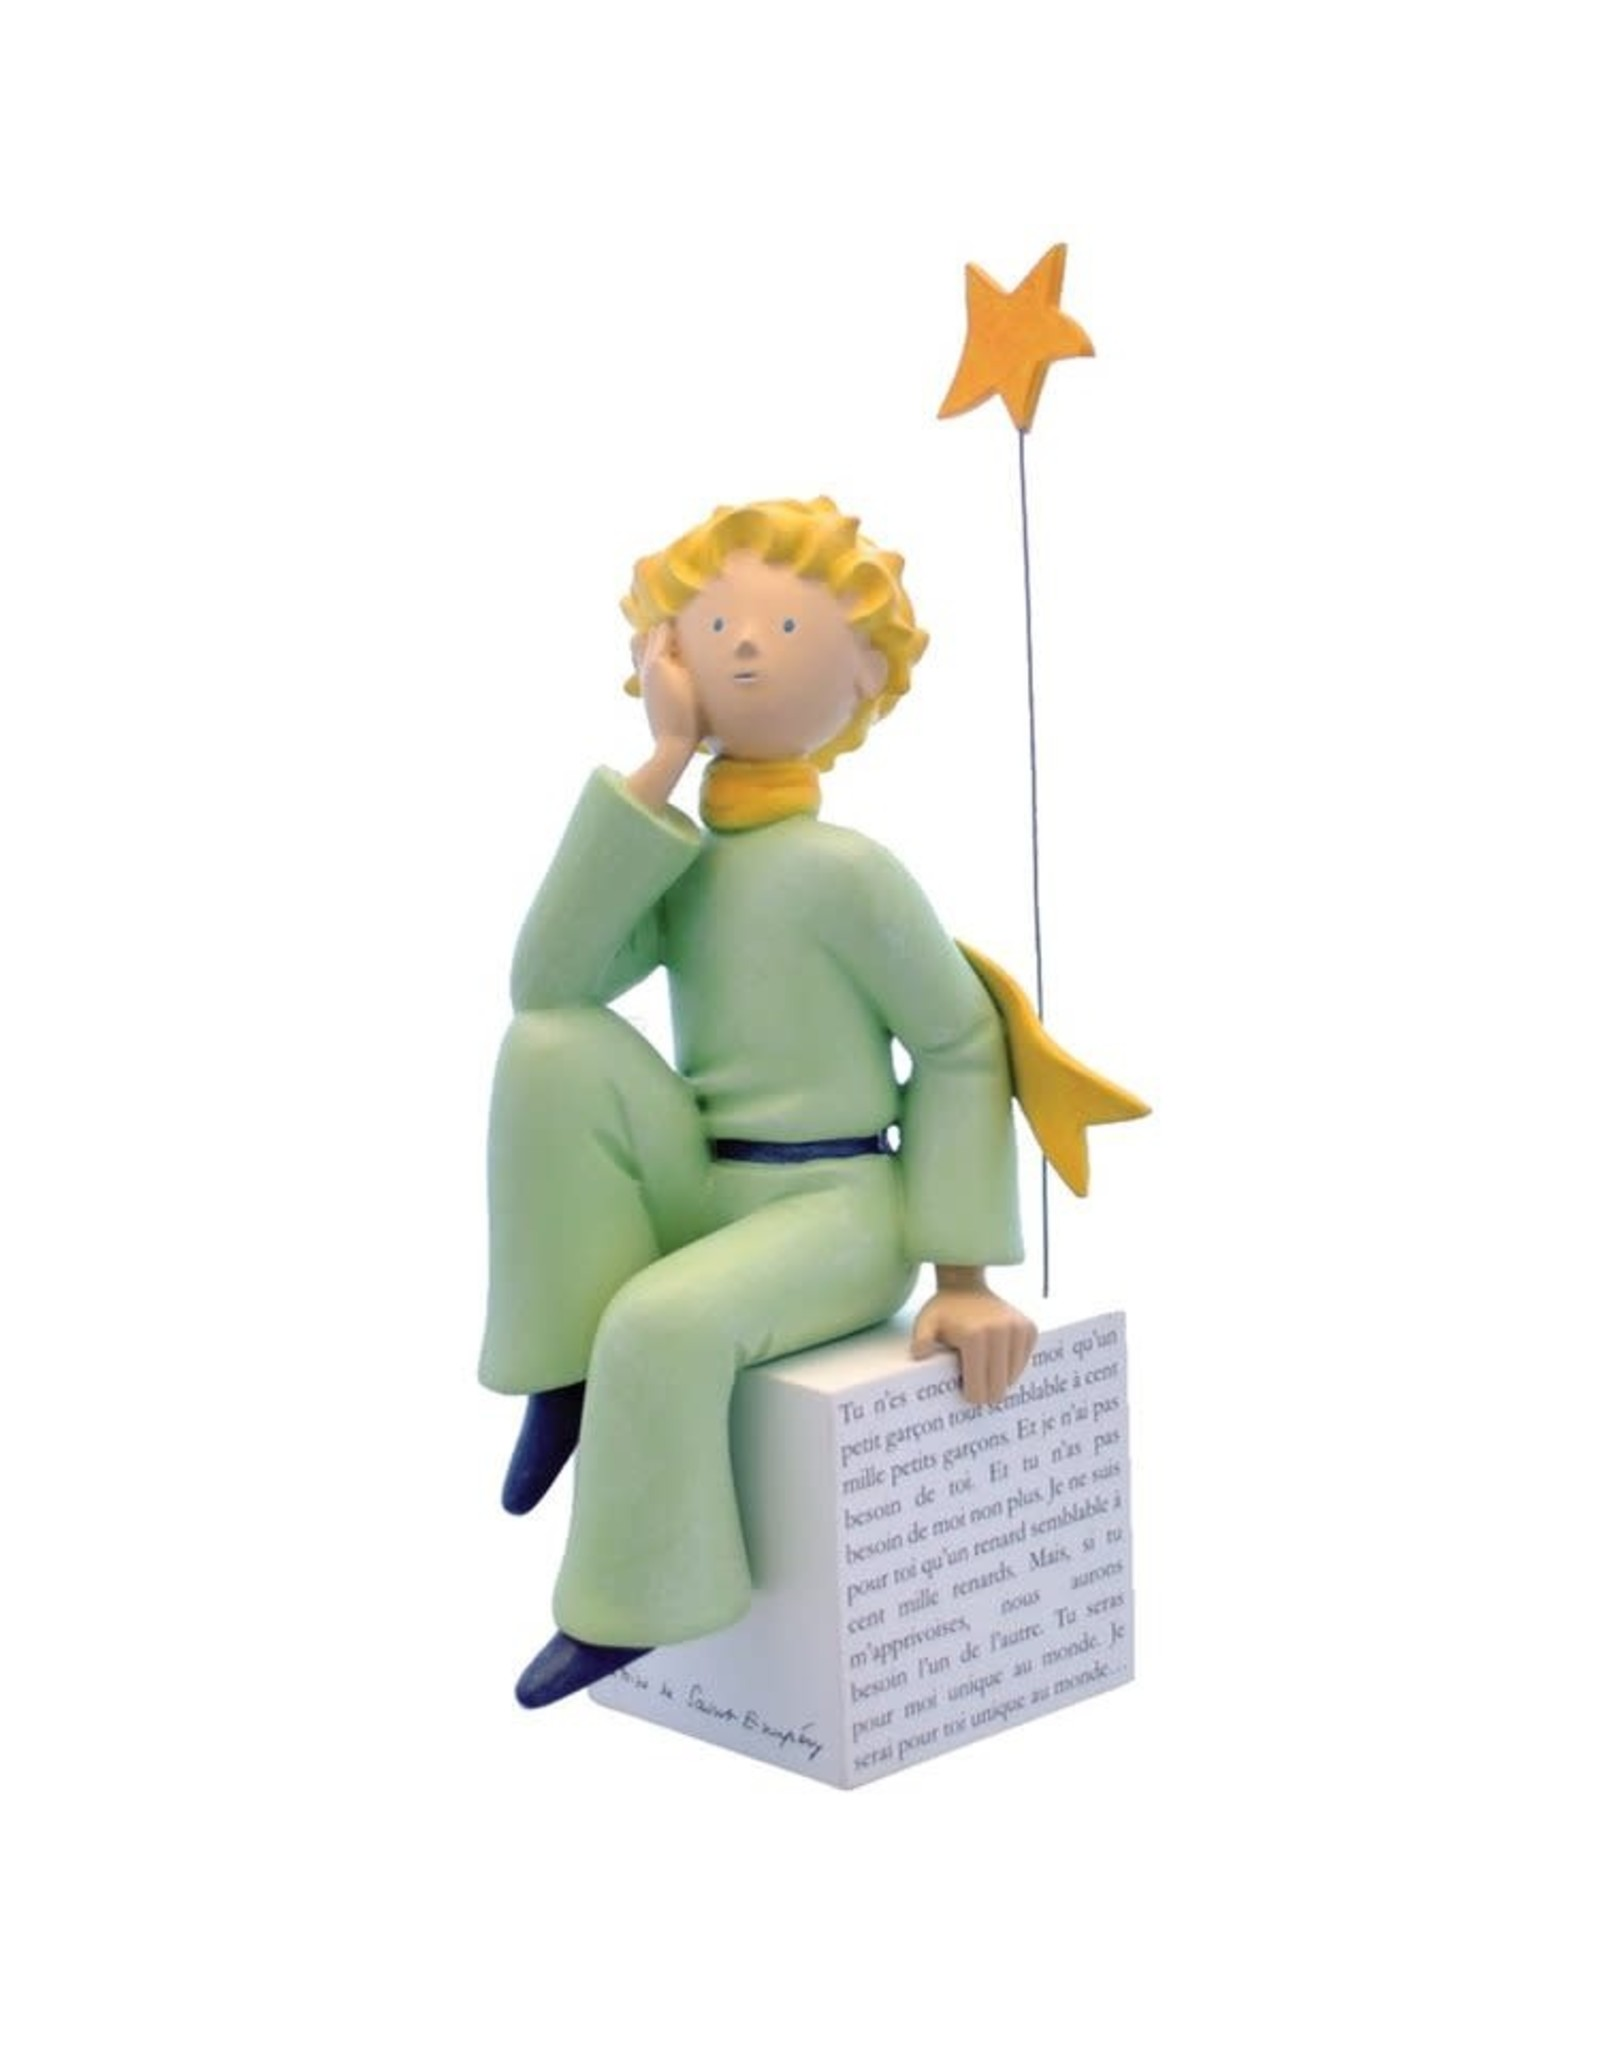 Collectoys THE LITTLE PRINCE Collector Statue - Le Petit Prince rêveur